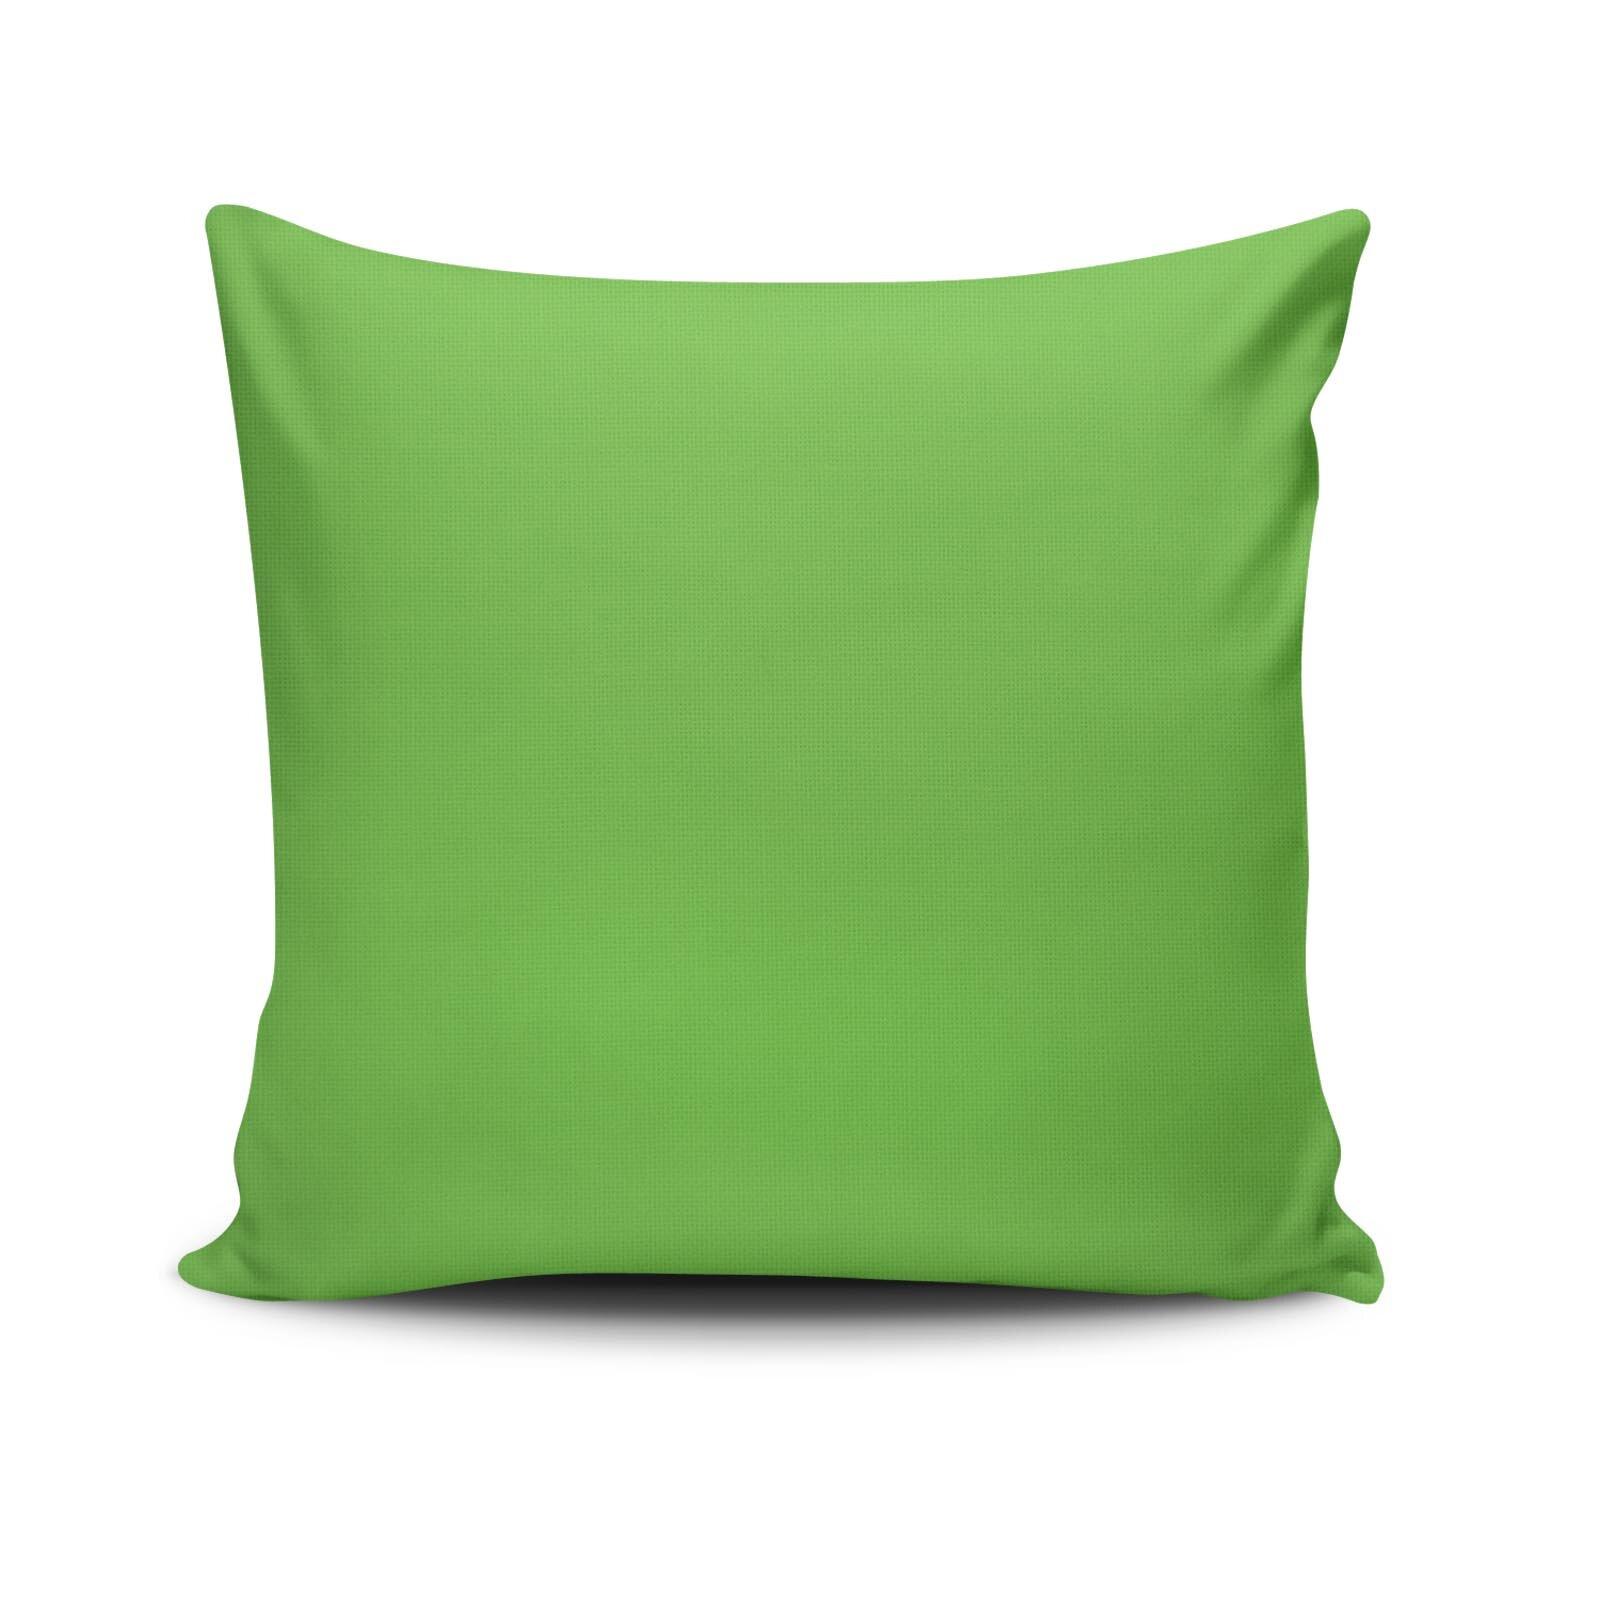 Perna decorativa Spiffy, Dimensiune: 45 x 45 cm, Material exterior: 50% bumbac / 50% poliester 425SPF0192